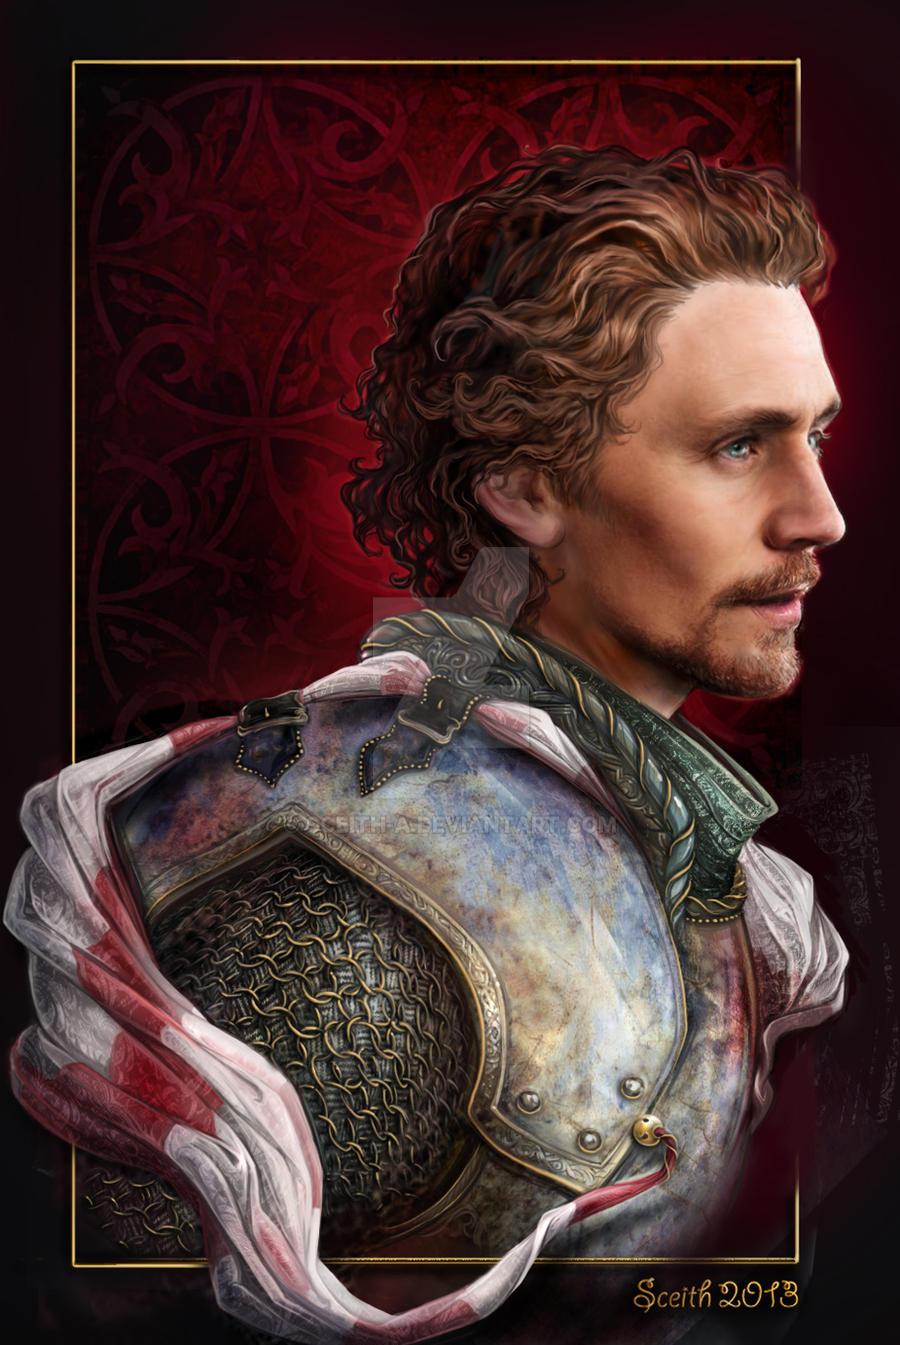 Prince hal transformation to king henry v